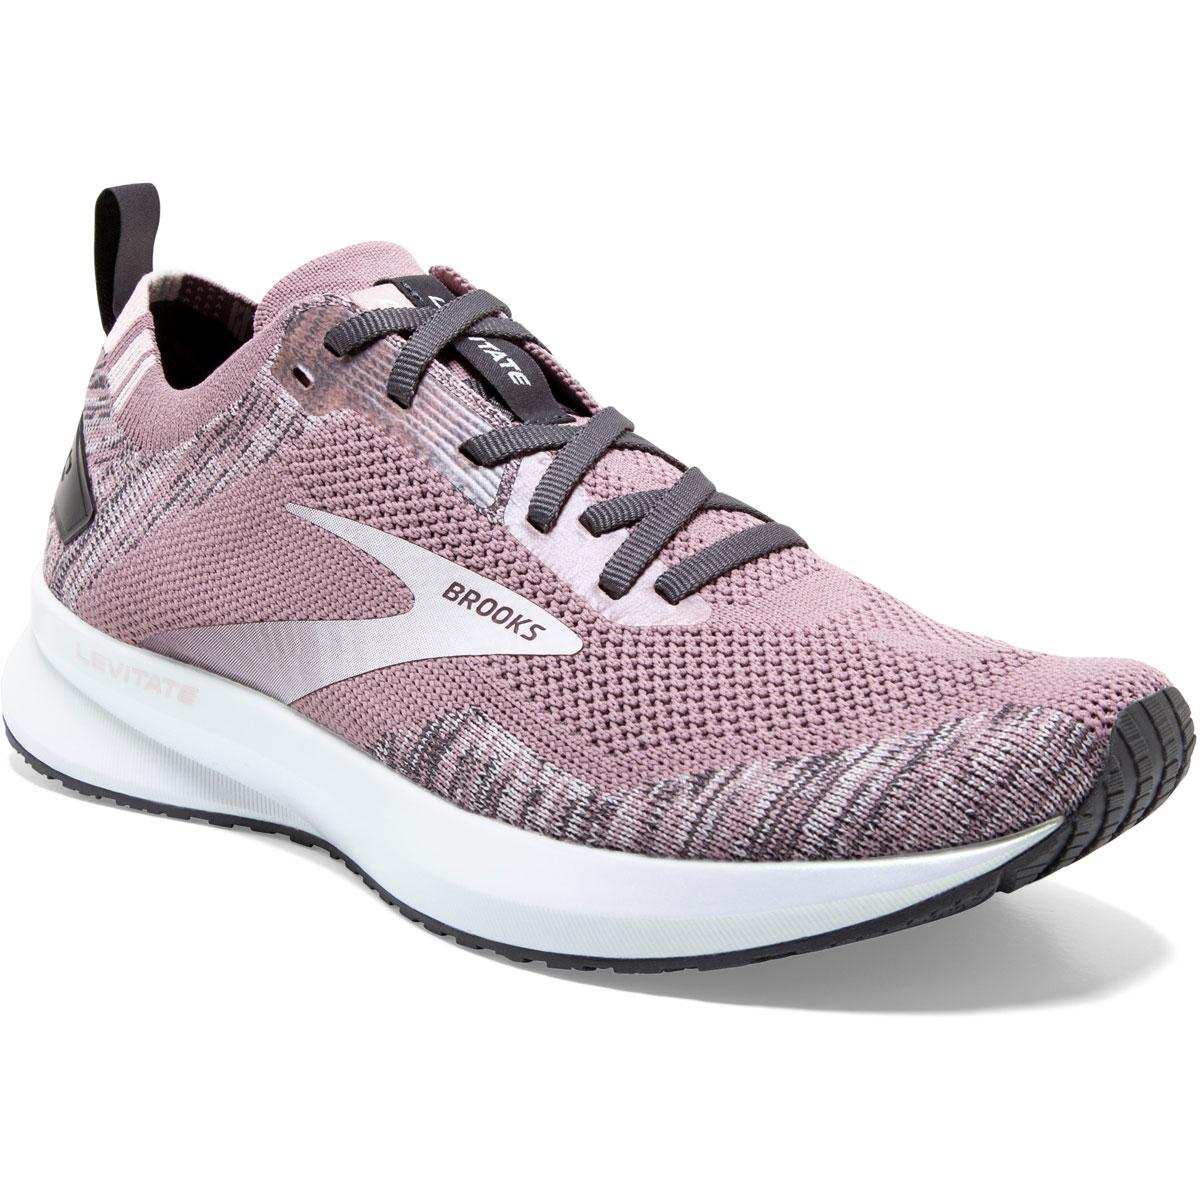 Women's Brooks Levitate 4 Running Shoe - Color: Blackened Pearl - Size: 5.5 - Width: Regular, Blackened Pearl, large, image 6